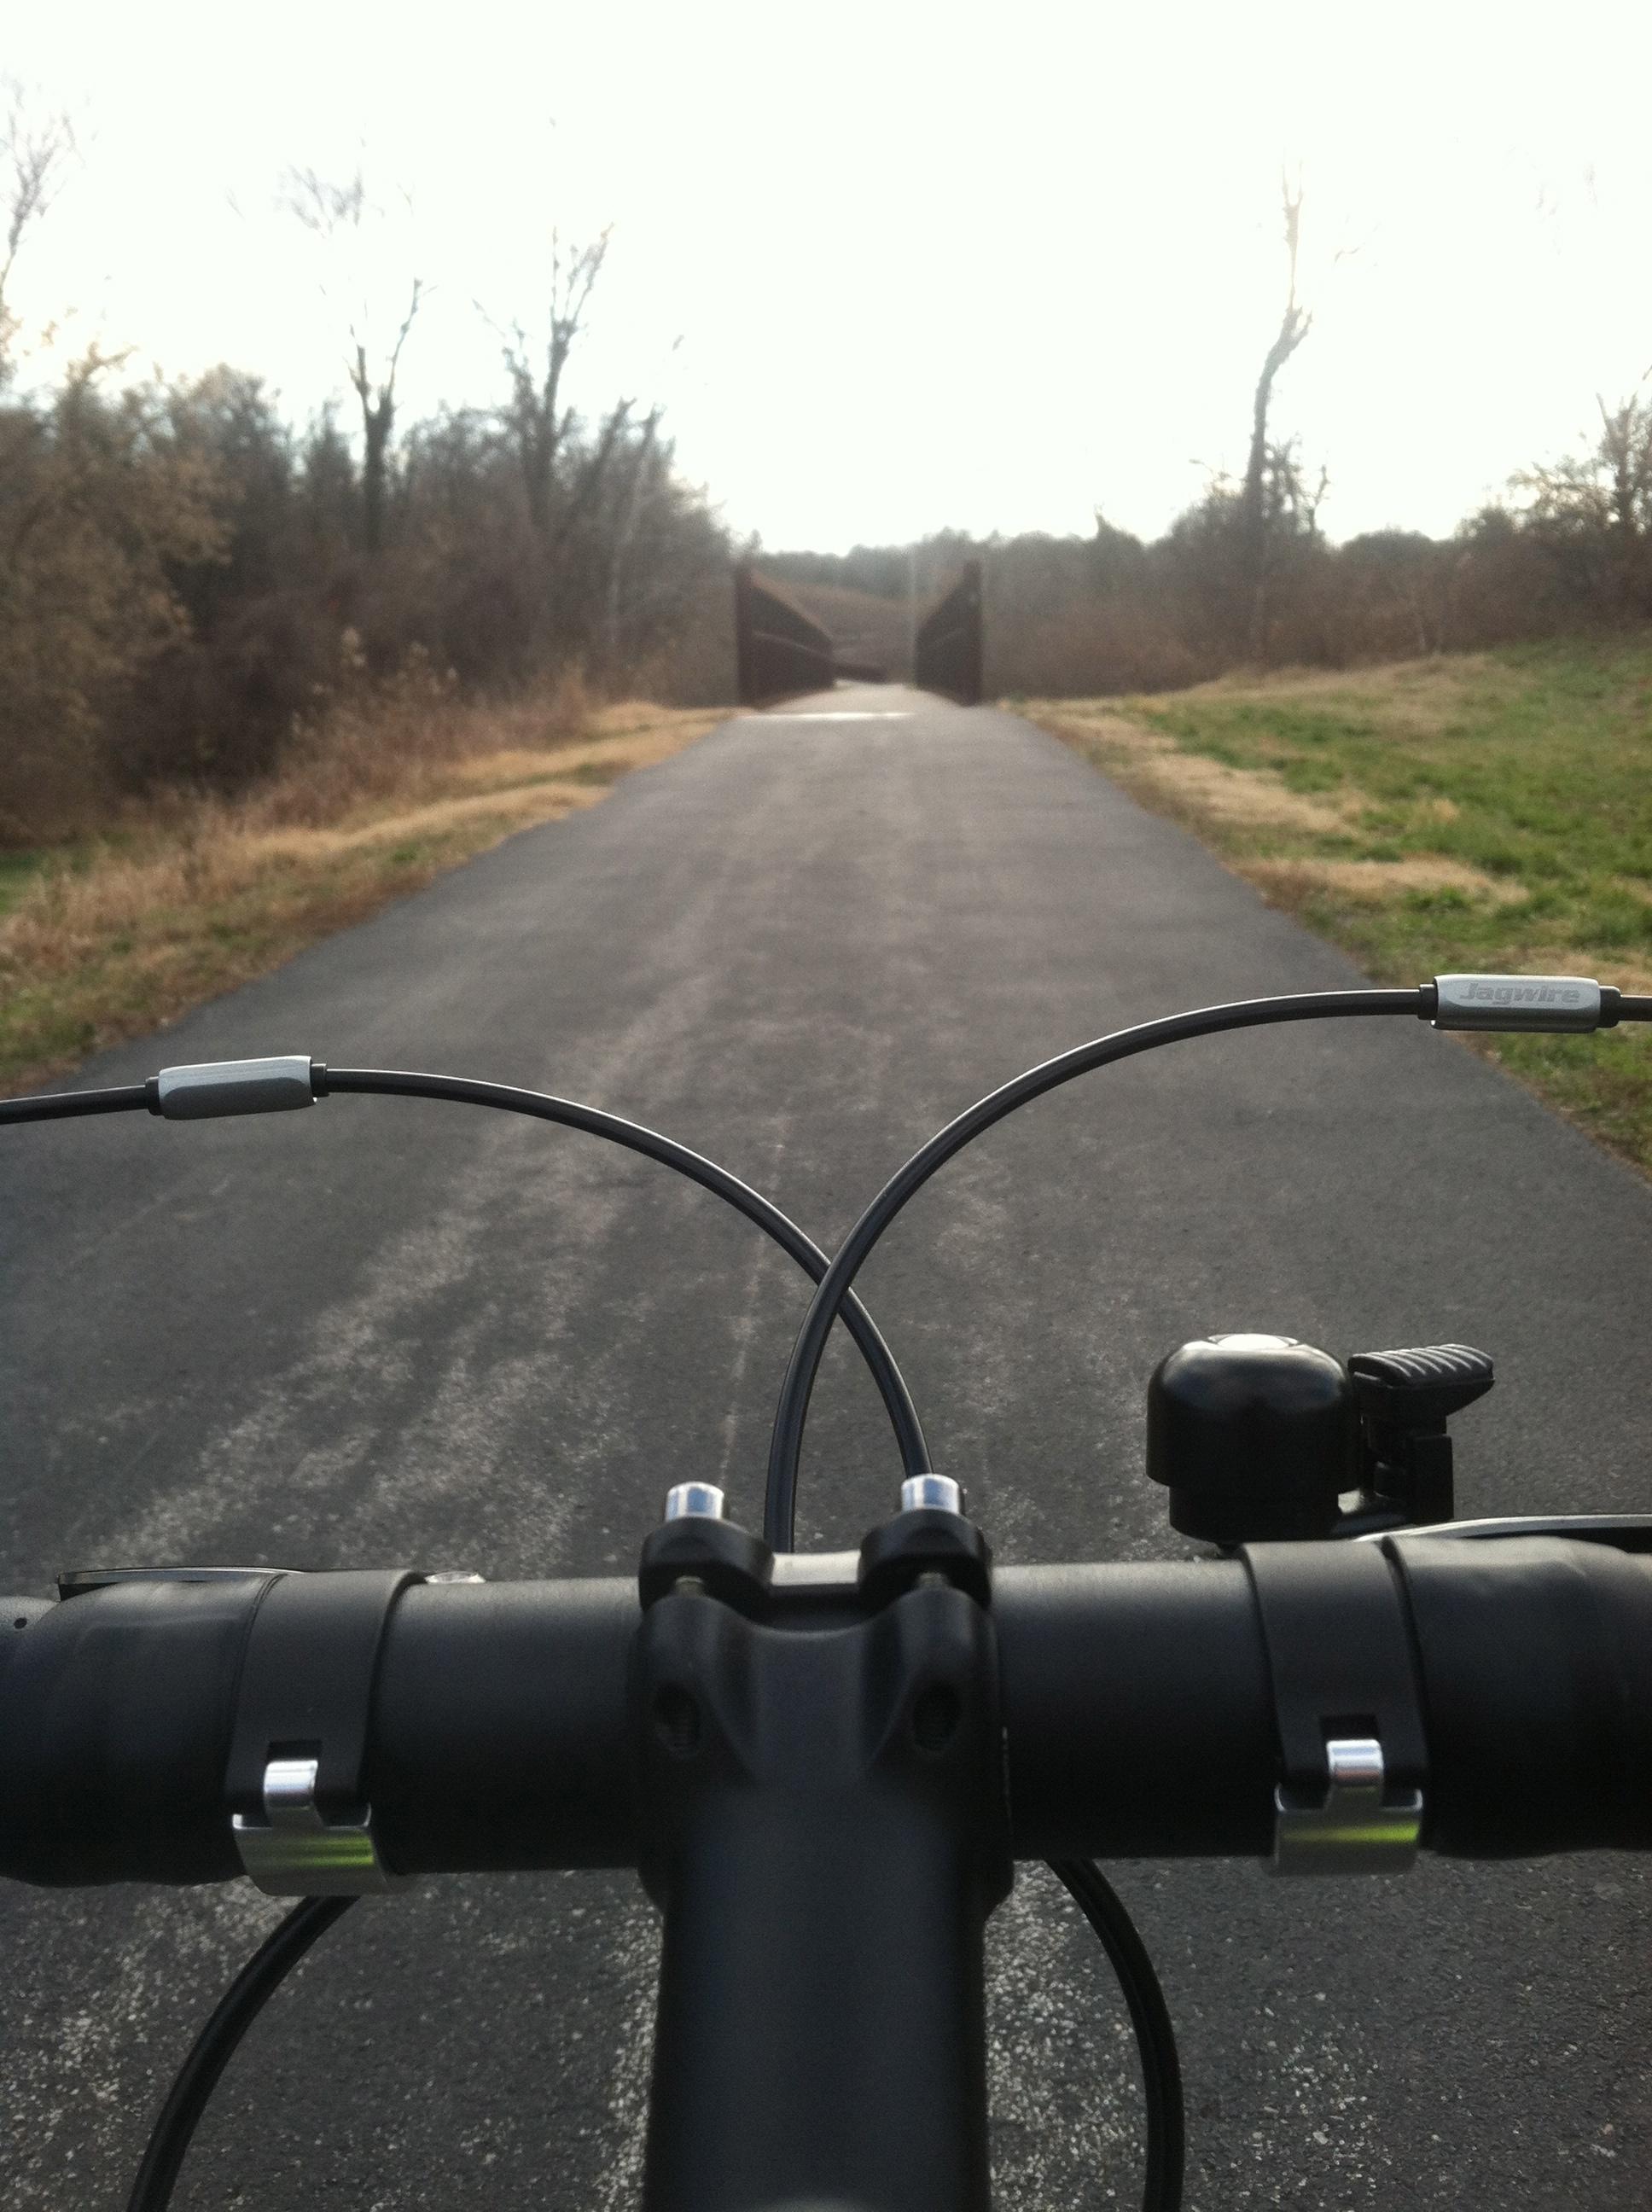 Gotta ride